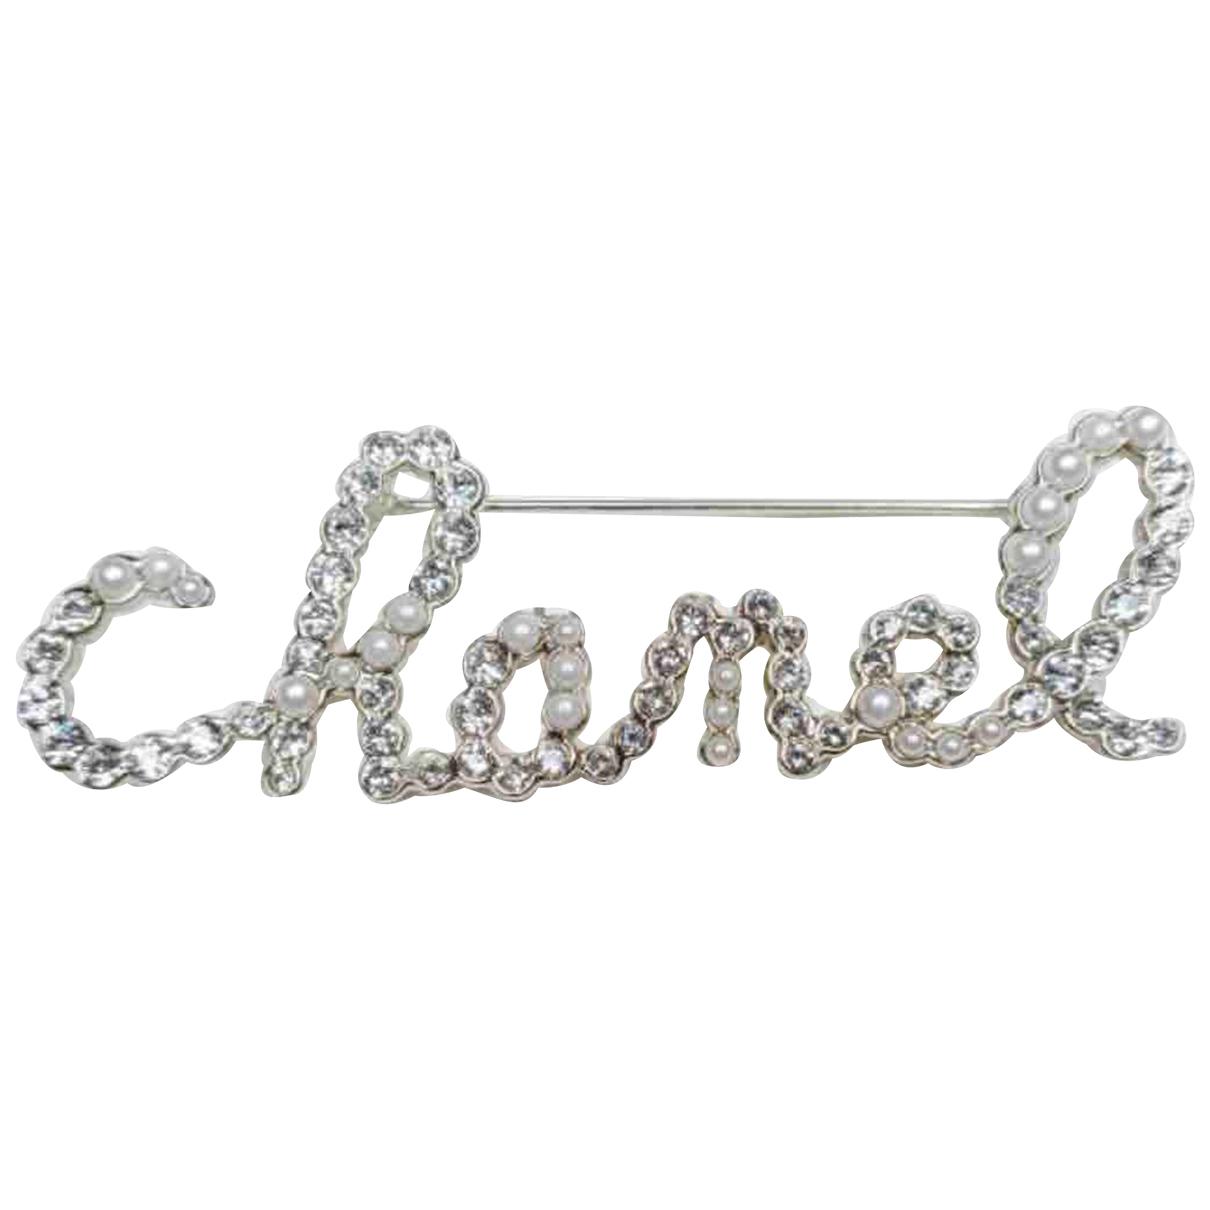 Broche CHANEL de Cristal Chanel